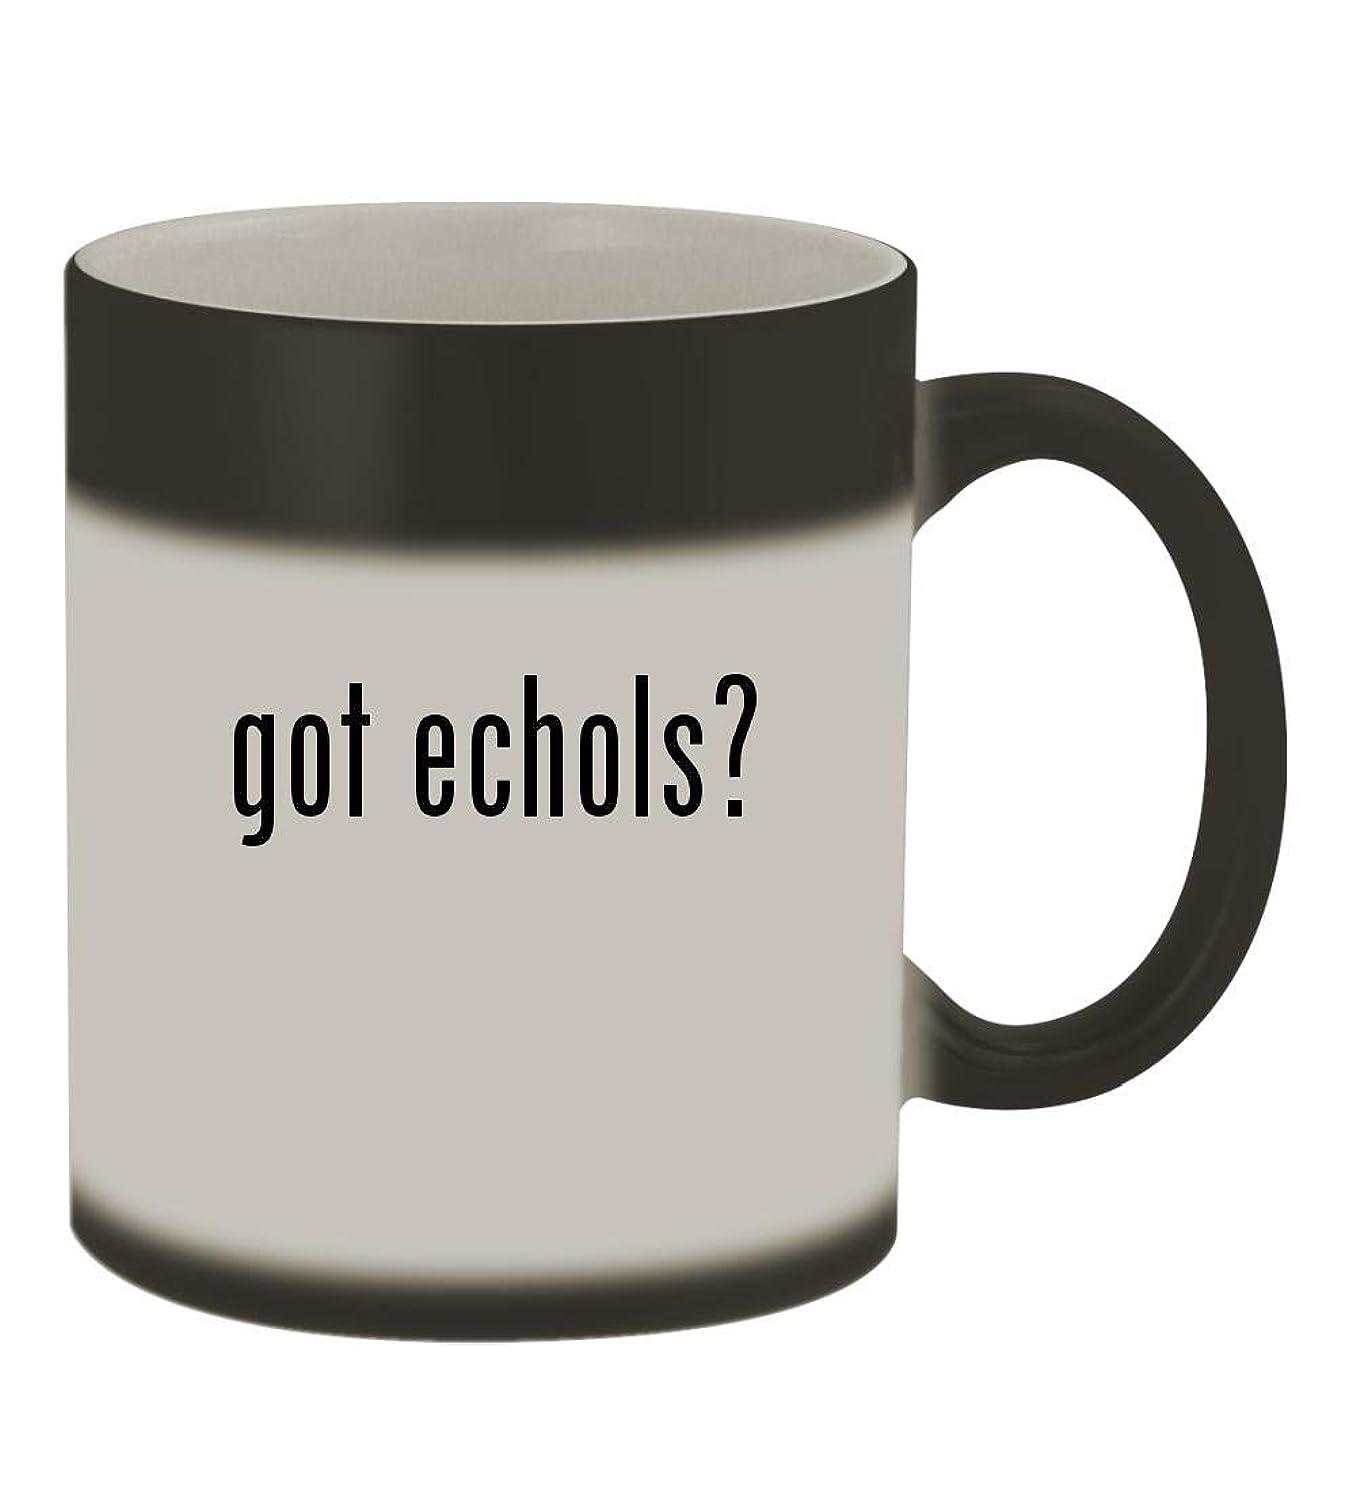 got echols? - 11oz Color Changing Sturdy Ceramic Coffee Cup Mug, Matte Black